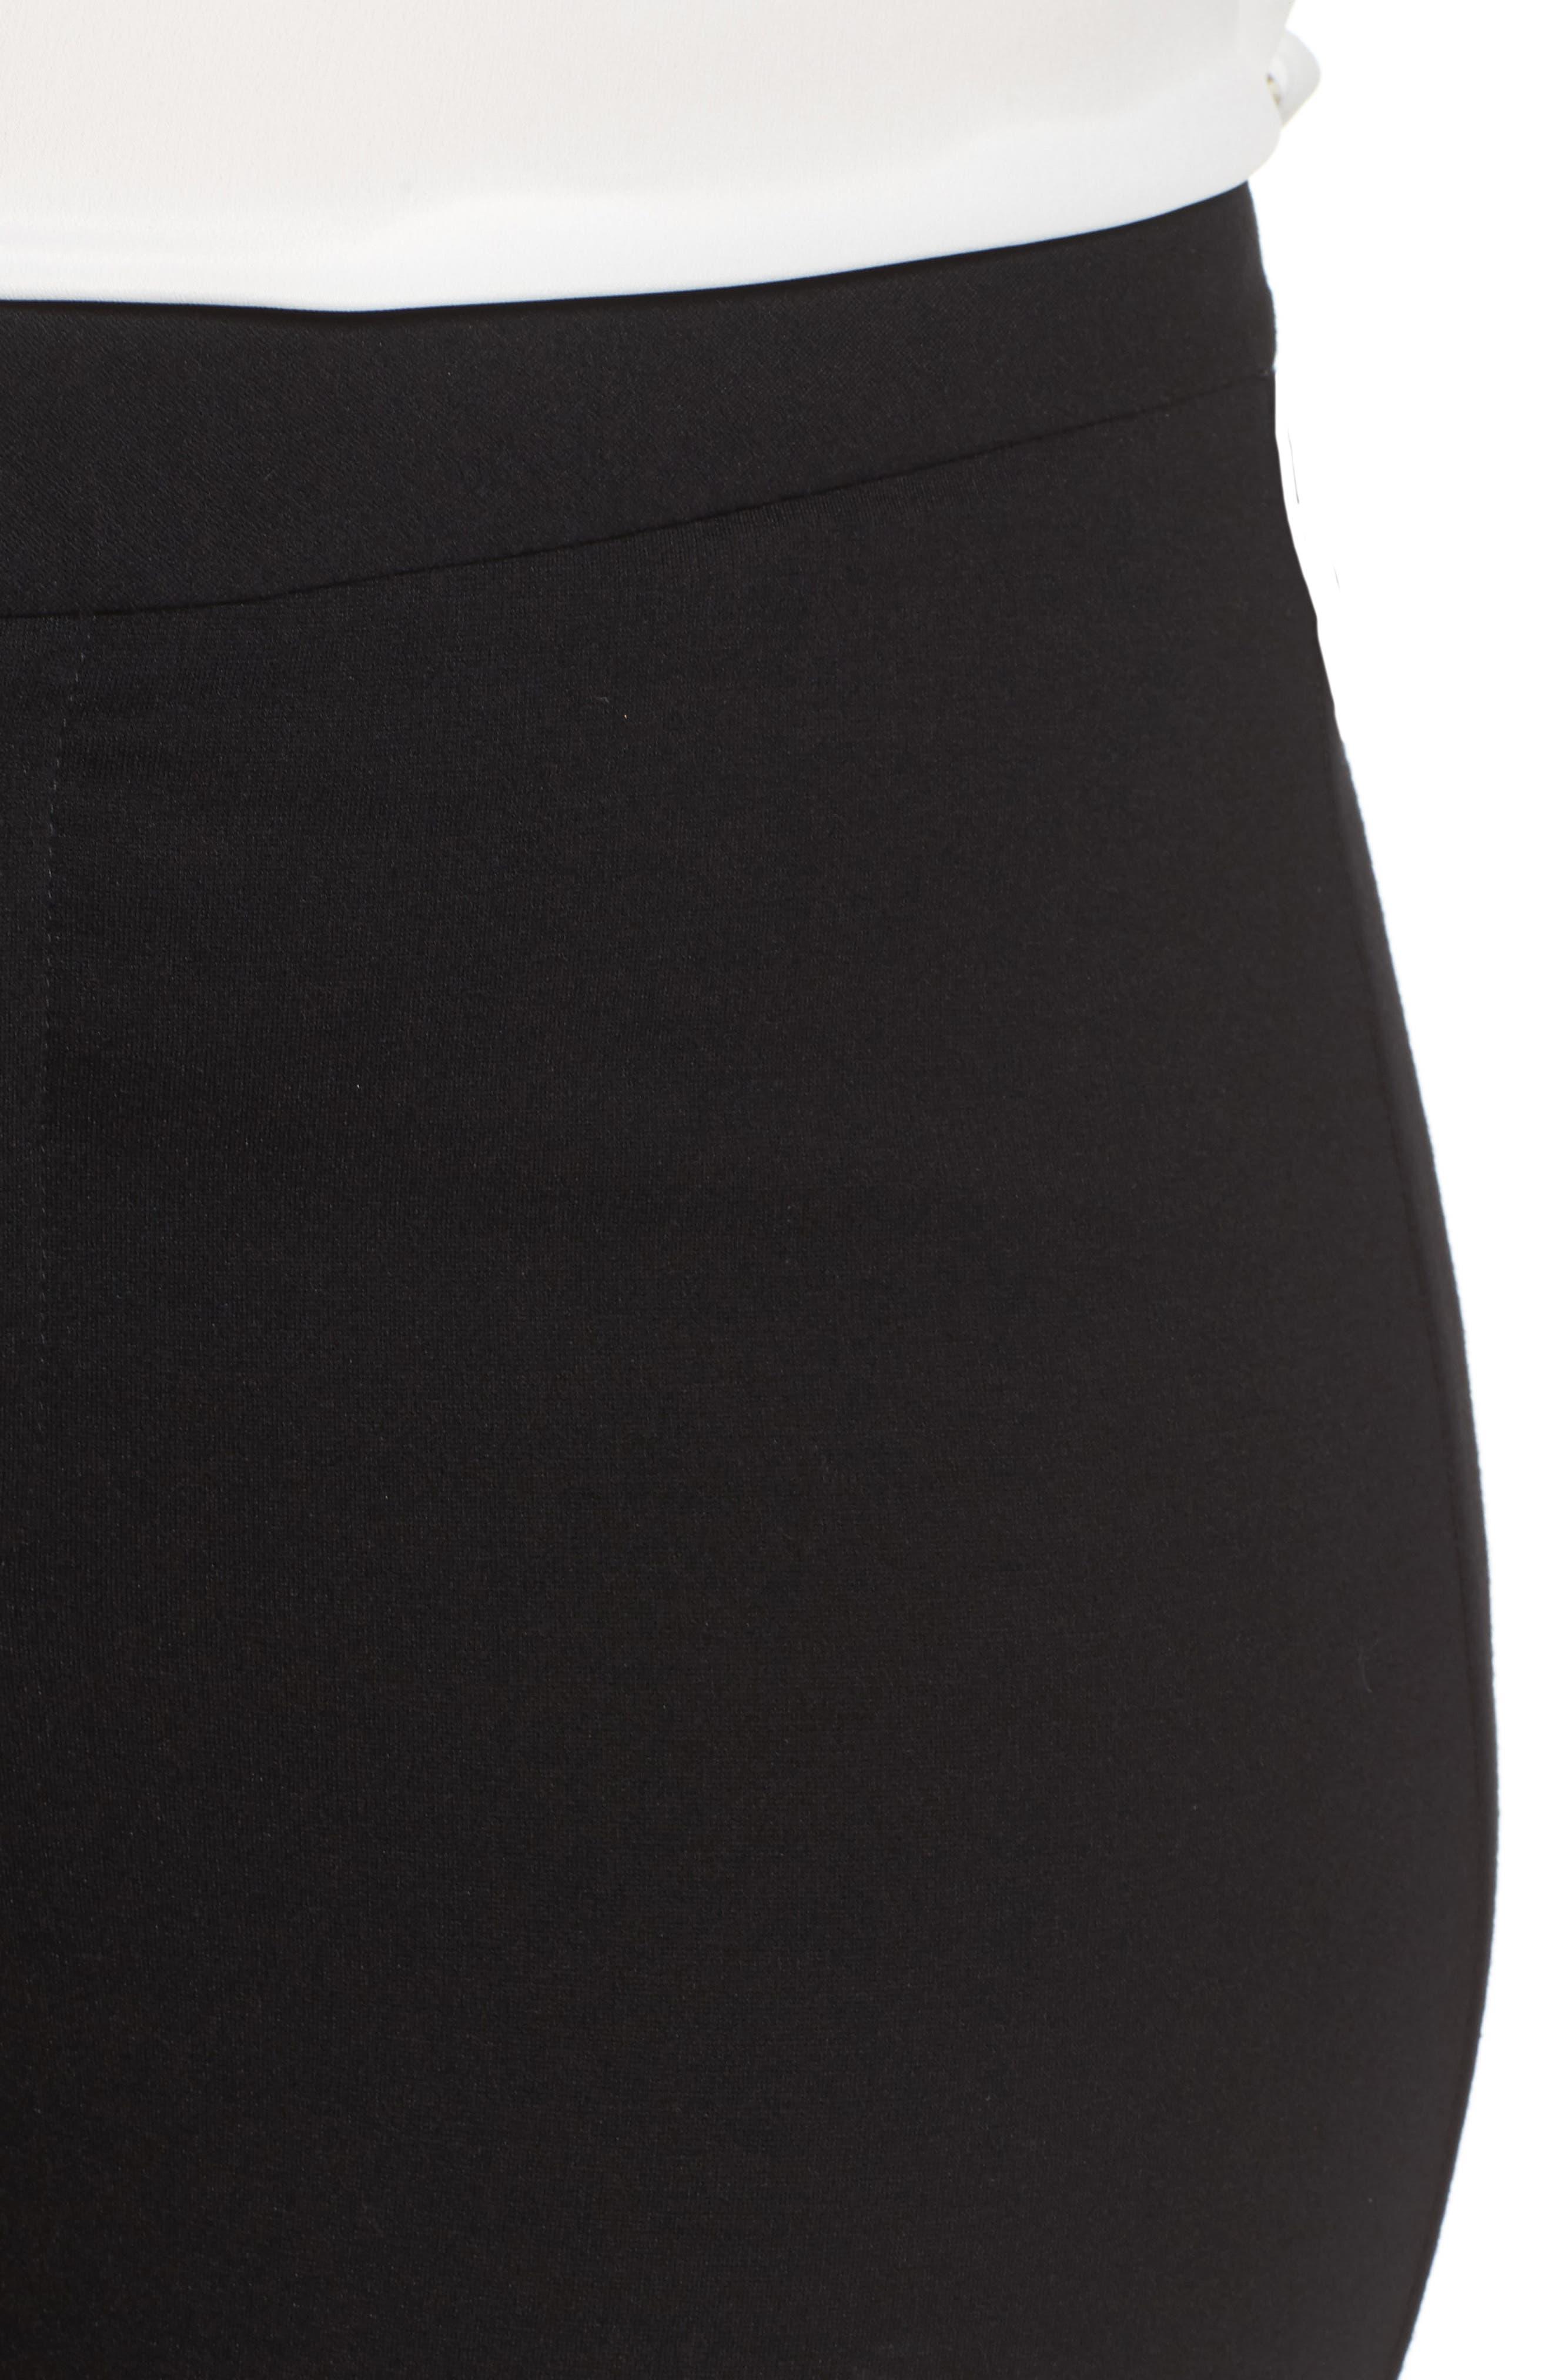 Stretch Knit Straight Leg Trousers,                             Alternate thumbnail 5, color,                             BLACK